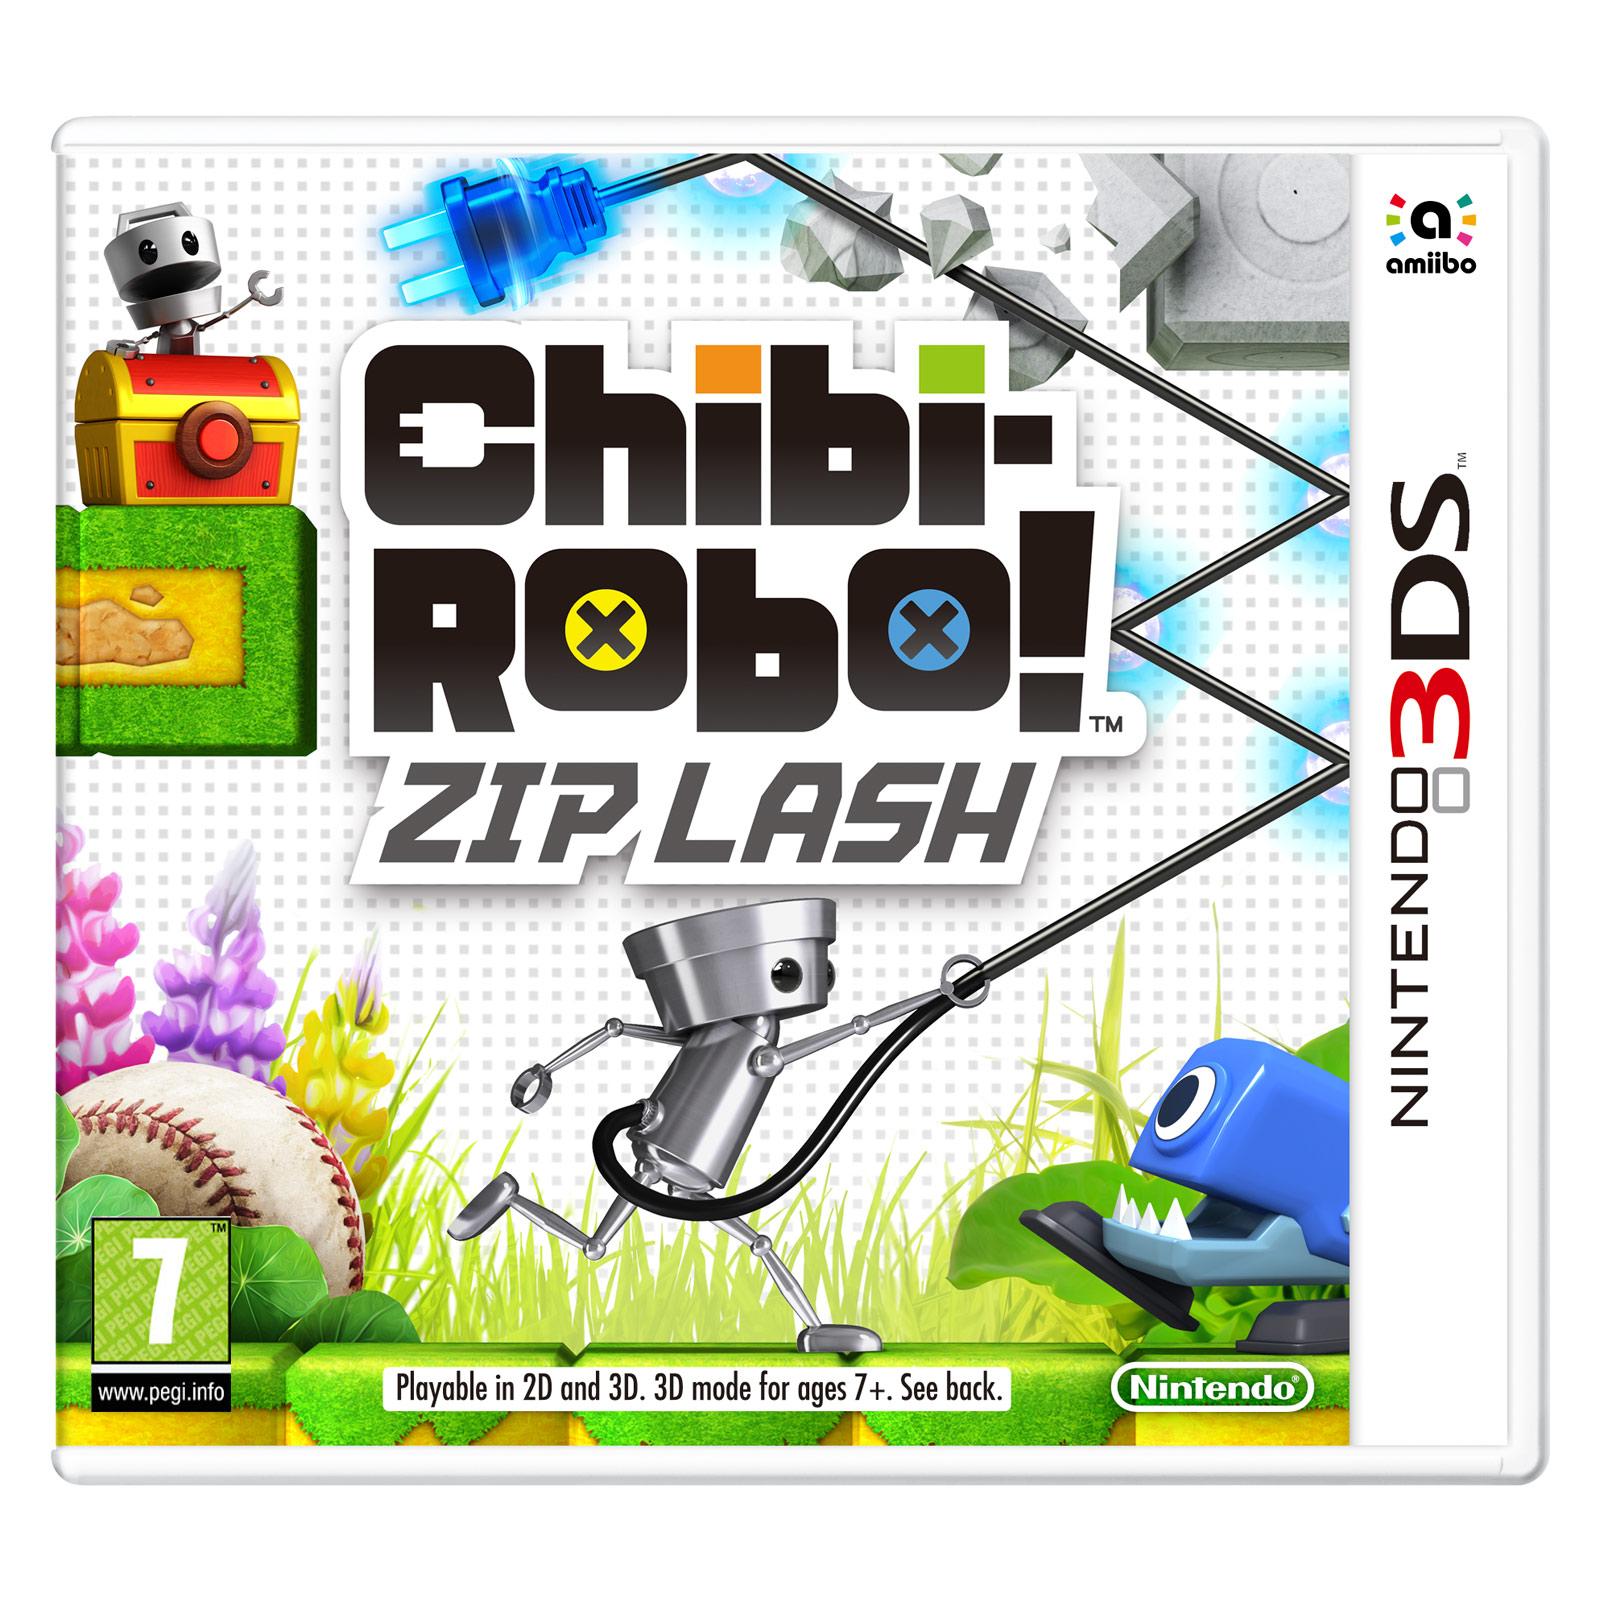 Jeux Nintendo 3DS Chibi-Robo! Zip Lash (Nintendo 3DS/2DS) Chibi-Robo! Zip Lash (Nintendo 3DS/2DS)